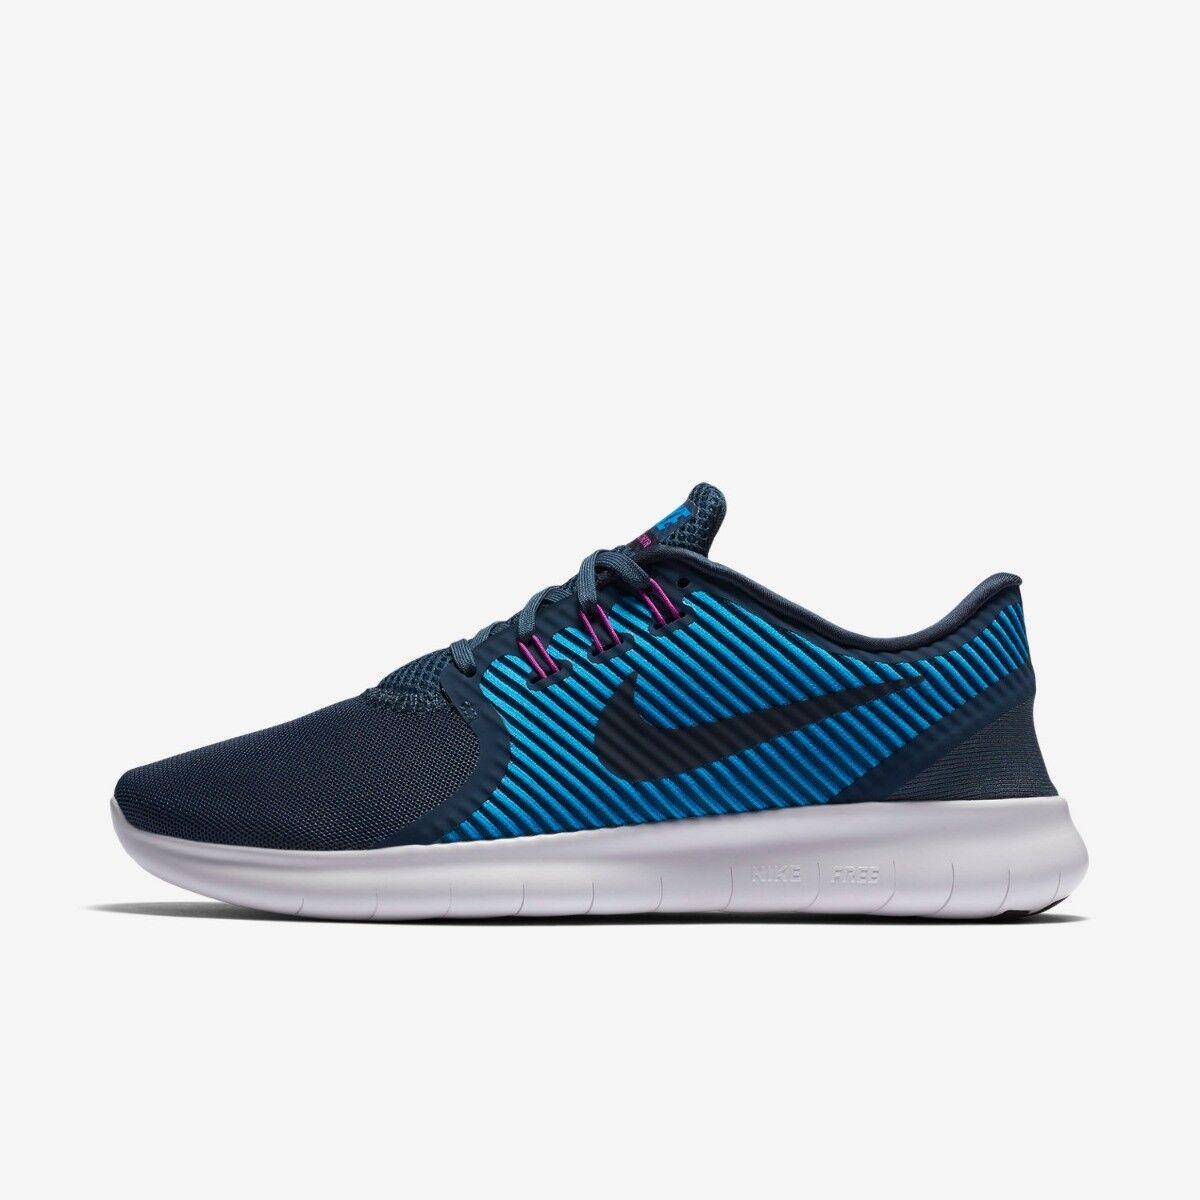 donna Nike Free Run CMTR Dimensione 3.5 4 blus  Running scarpe New  in linea